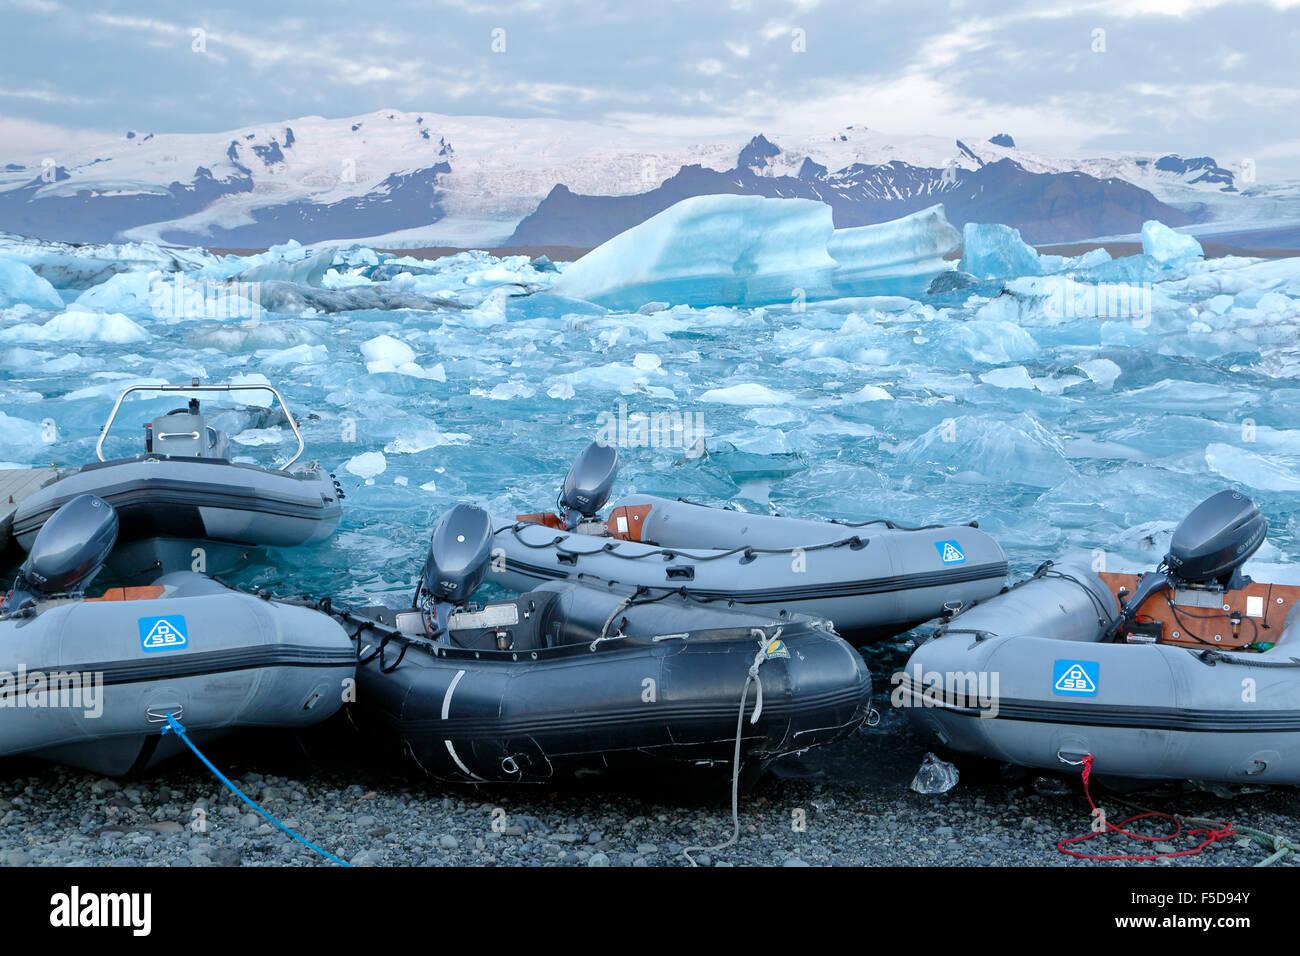 Dinghies, icebergs and snow-covered mountains, Jokulsarlon Glacier Lagoon,  Vatnajokull National Park, Iceland - Stock Image